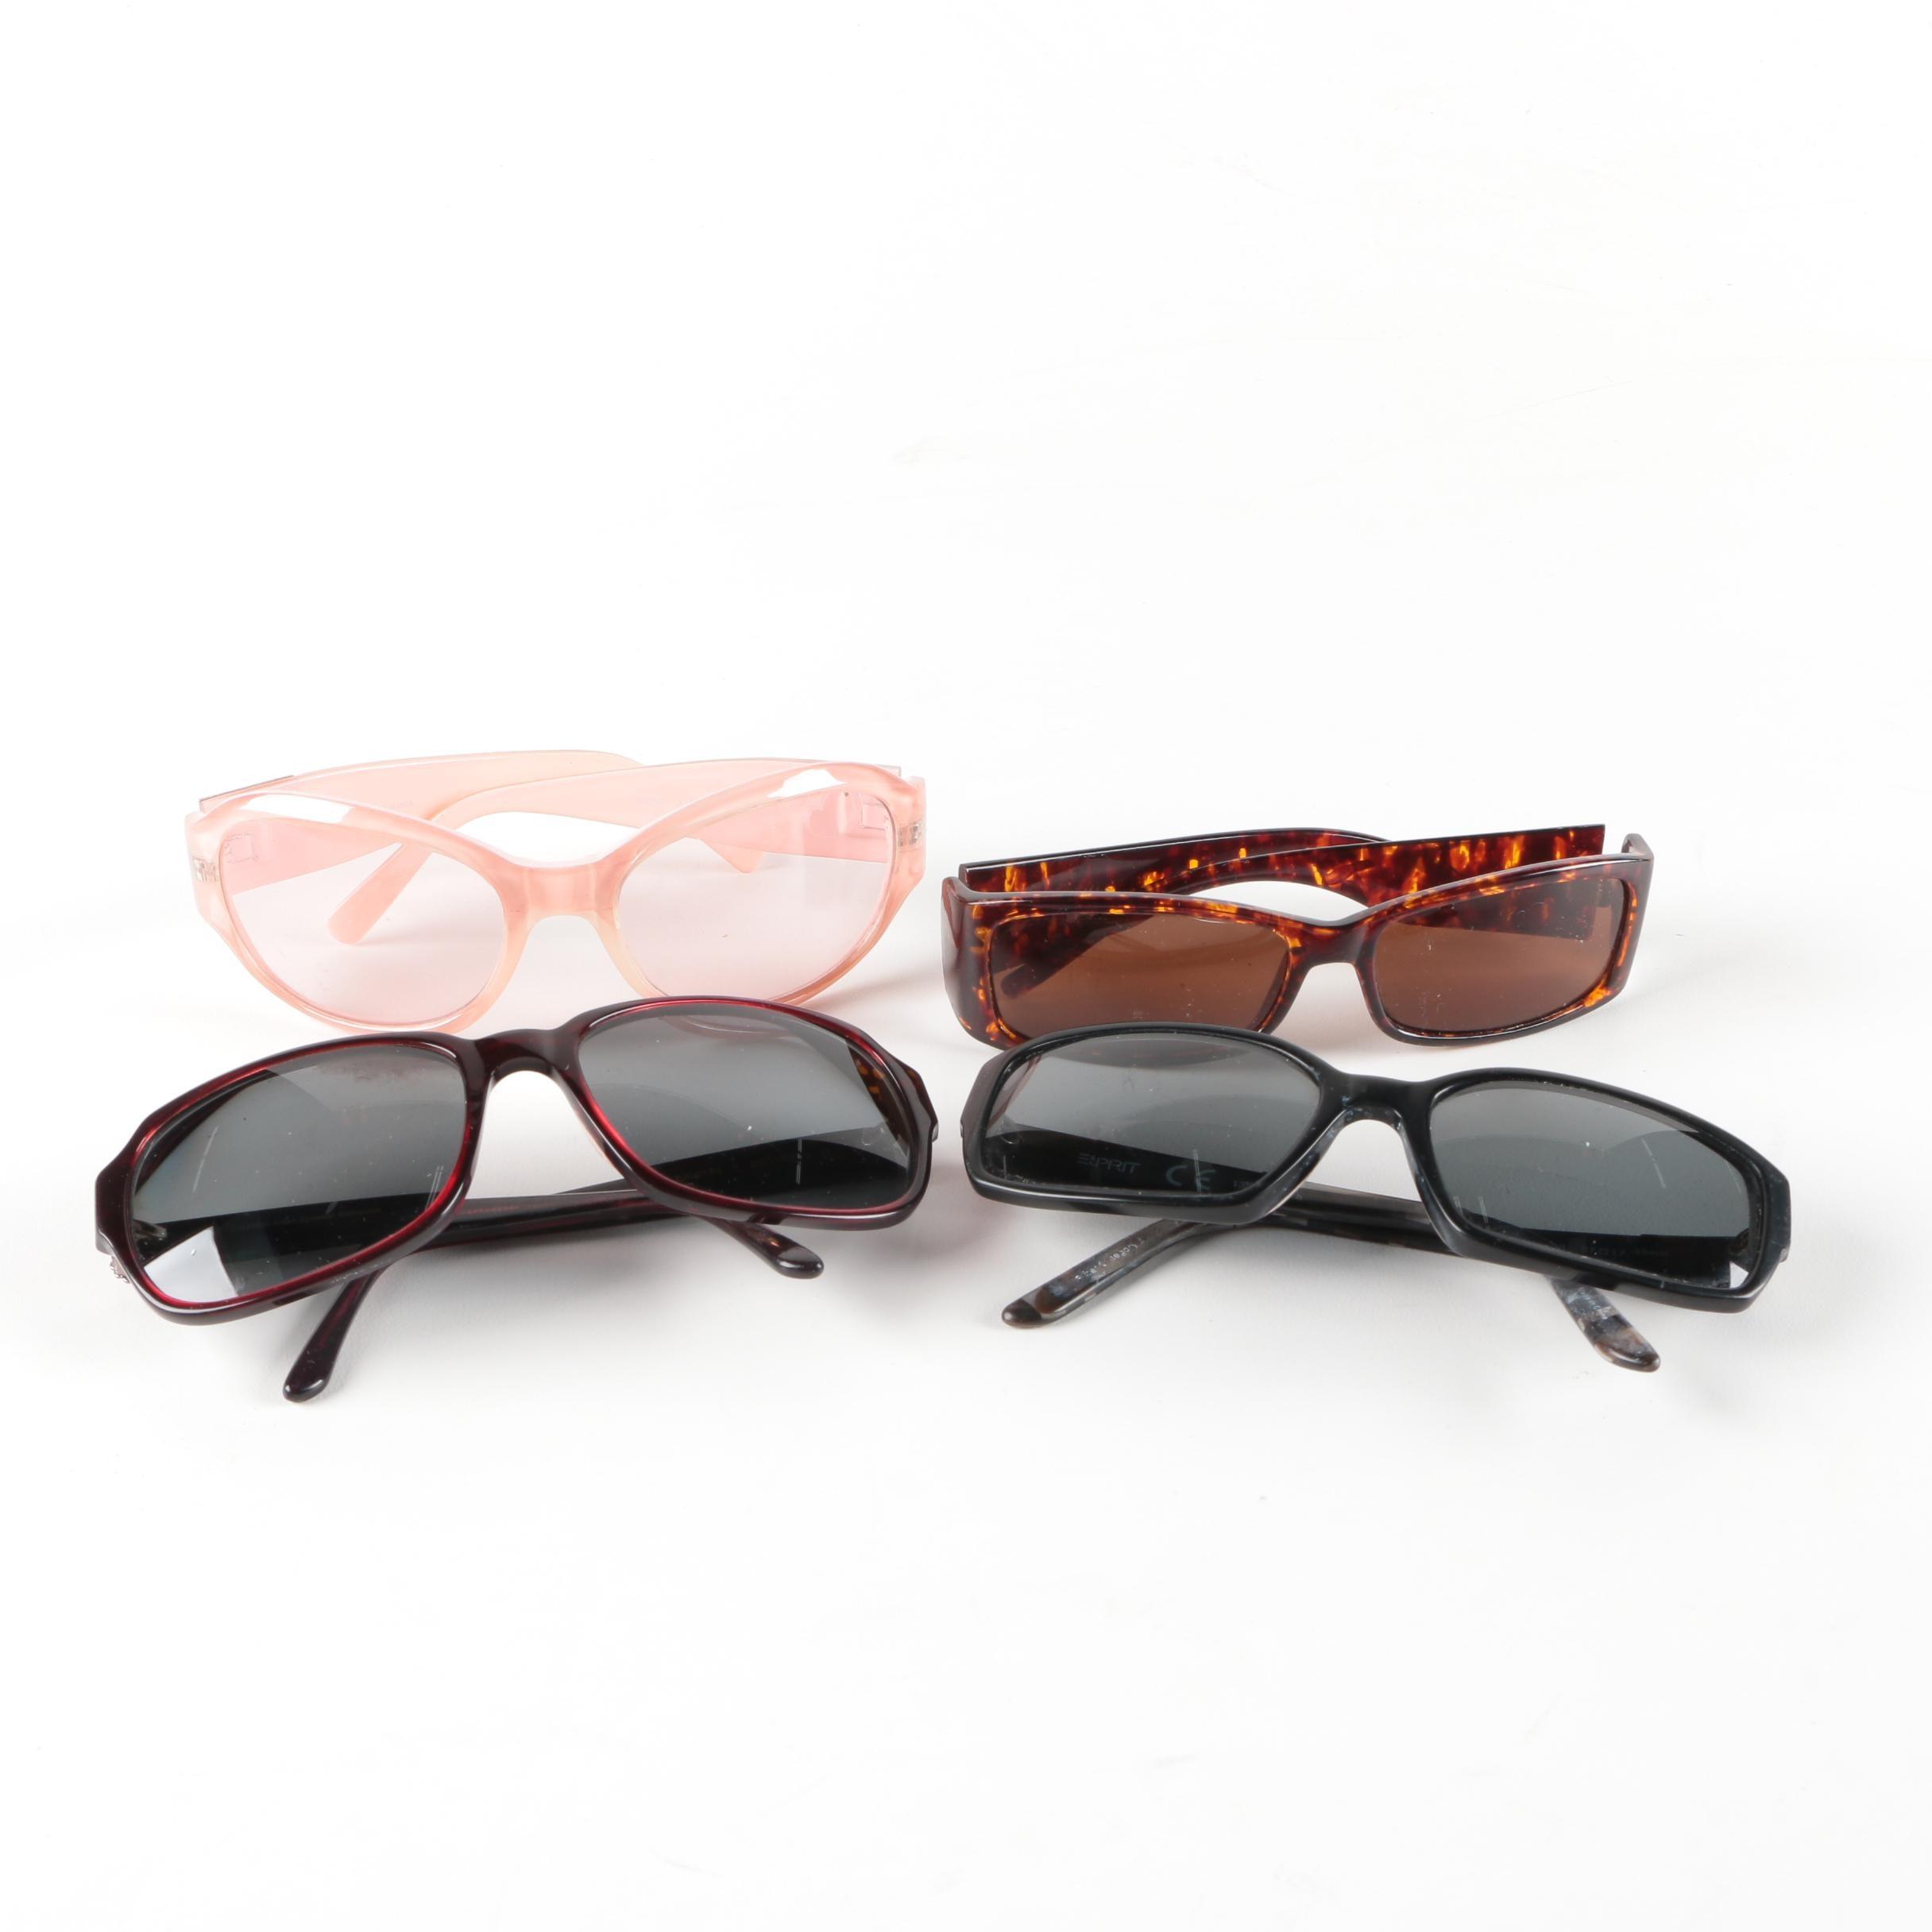 Sunglasses Including Elizabeth Arden